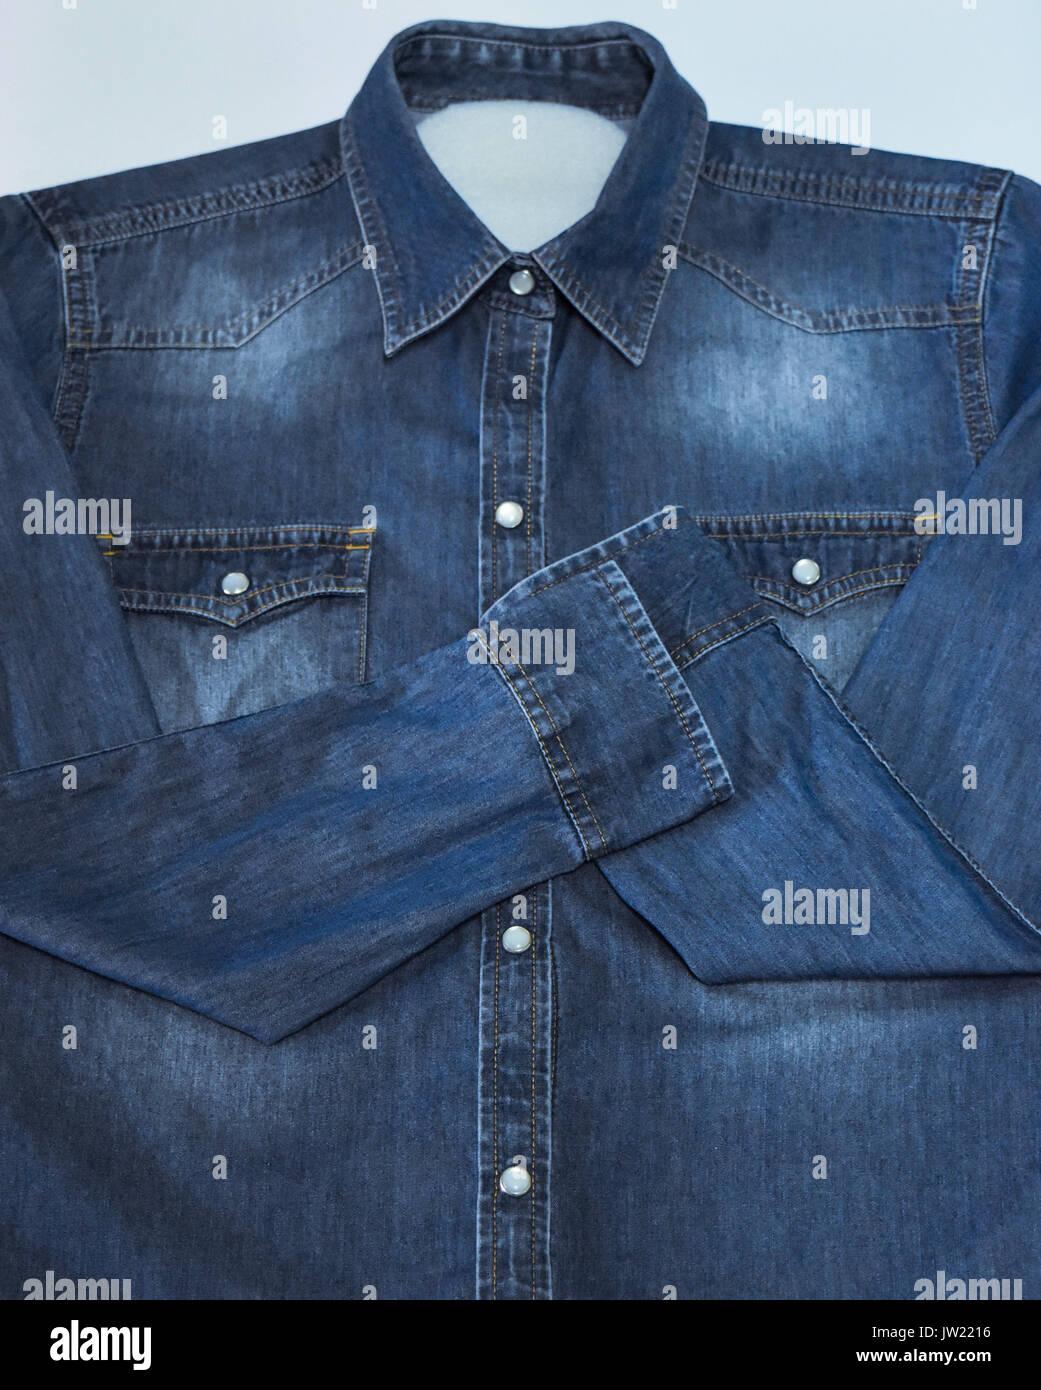 front of denim shirt in blur - Stock Image